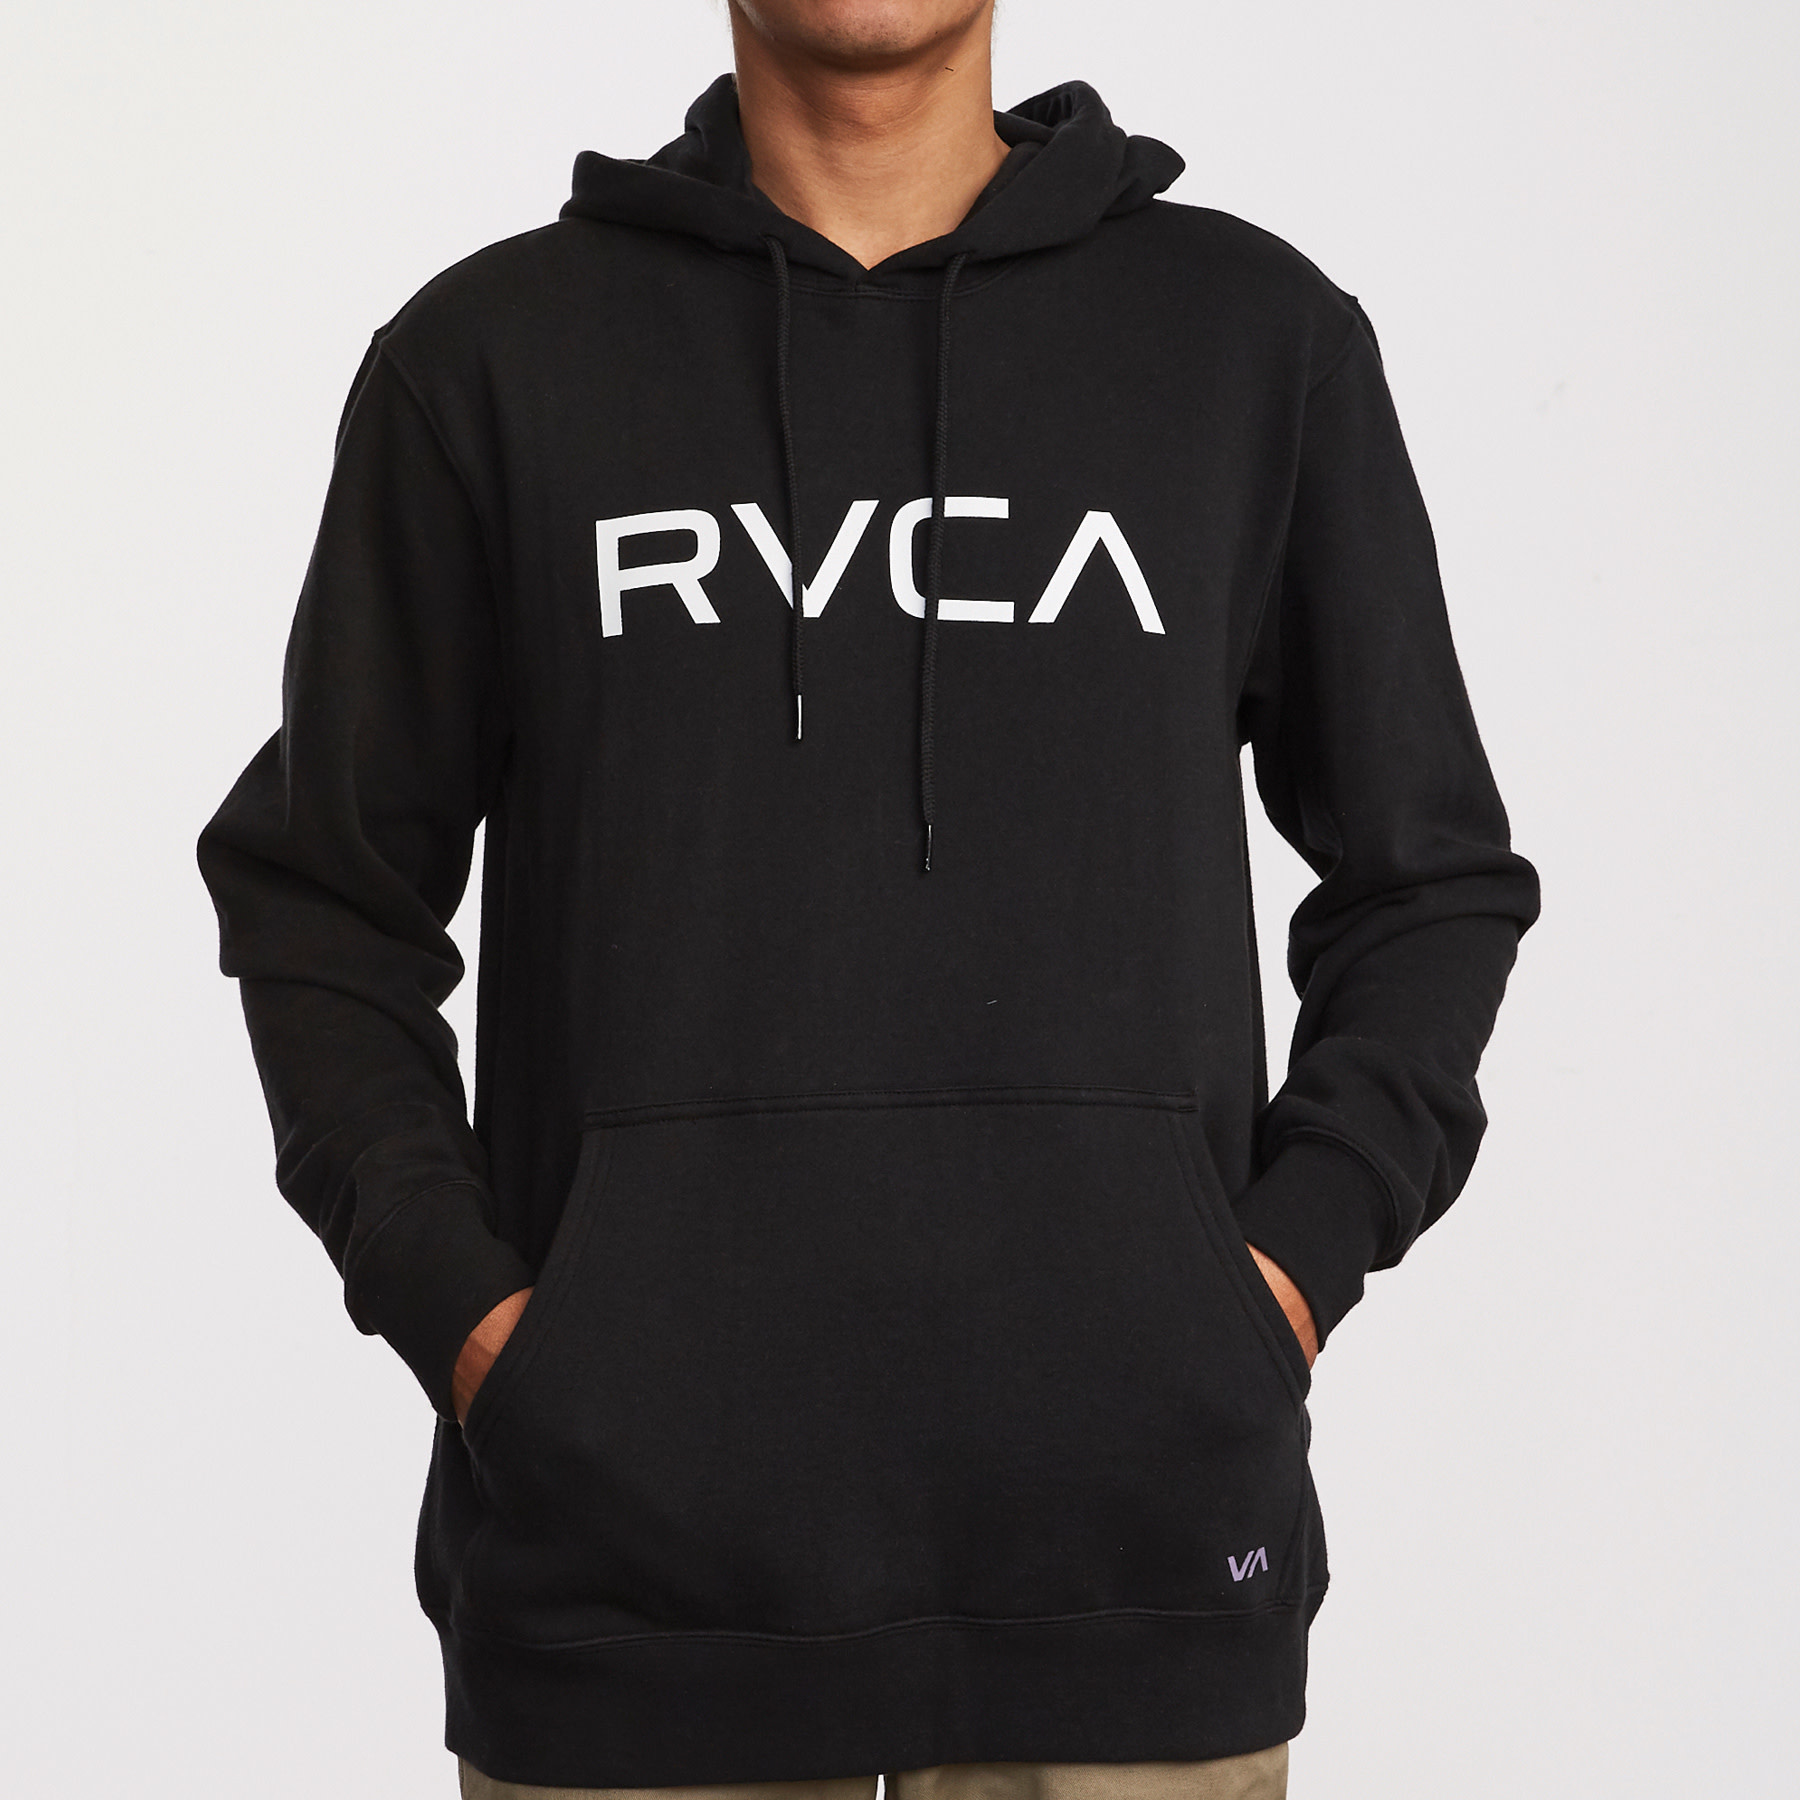 RVCA Womens Big Po Hooded Sweatshirt